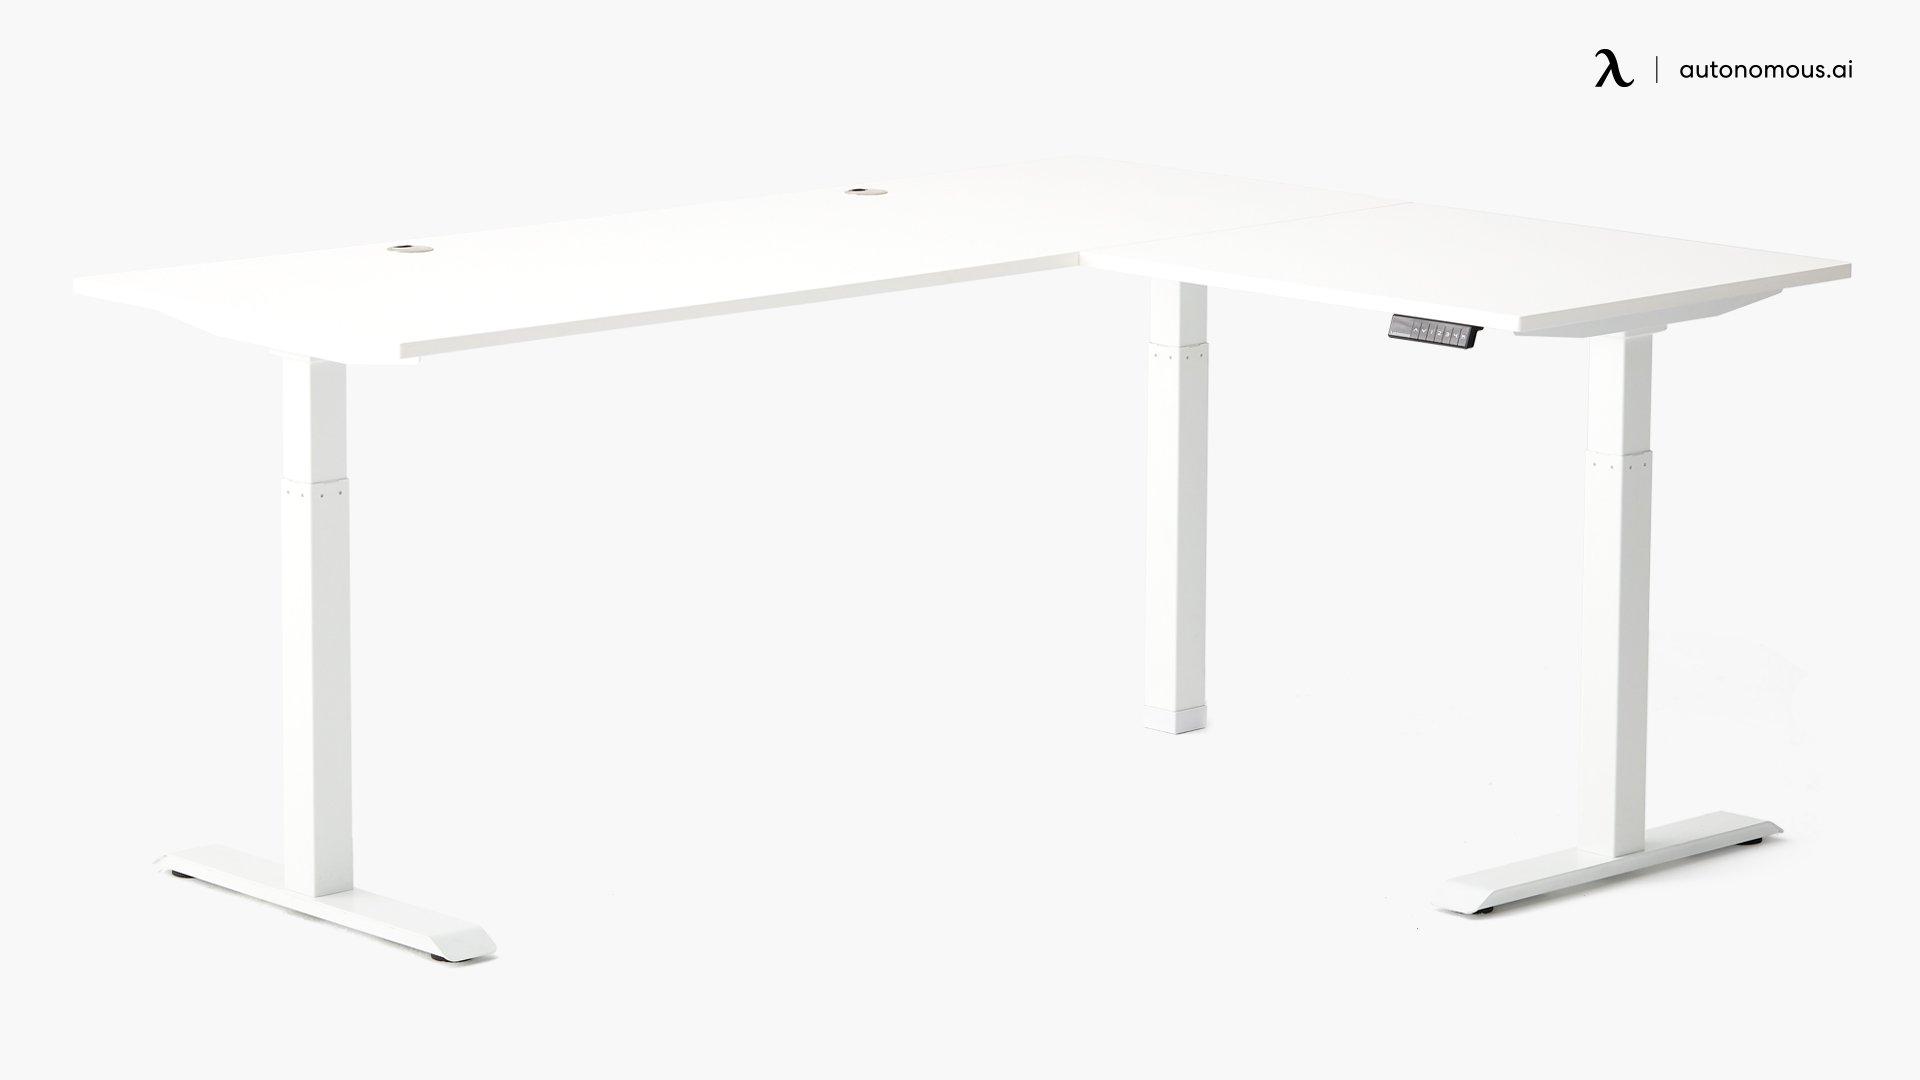 Best L-shaped Executive Desks for Your Business 2021